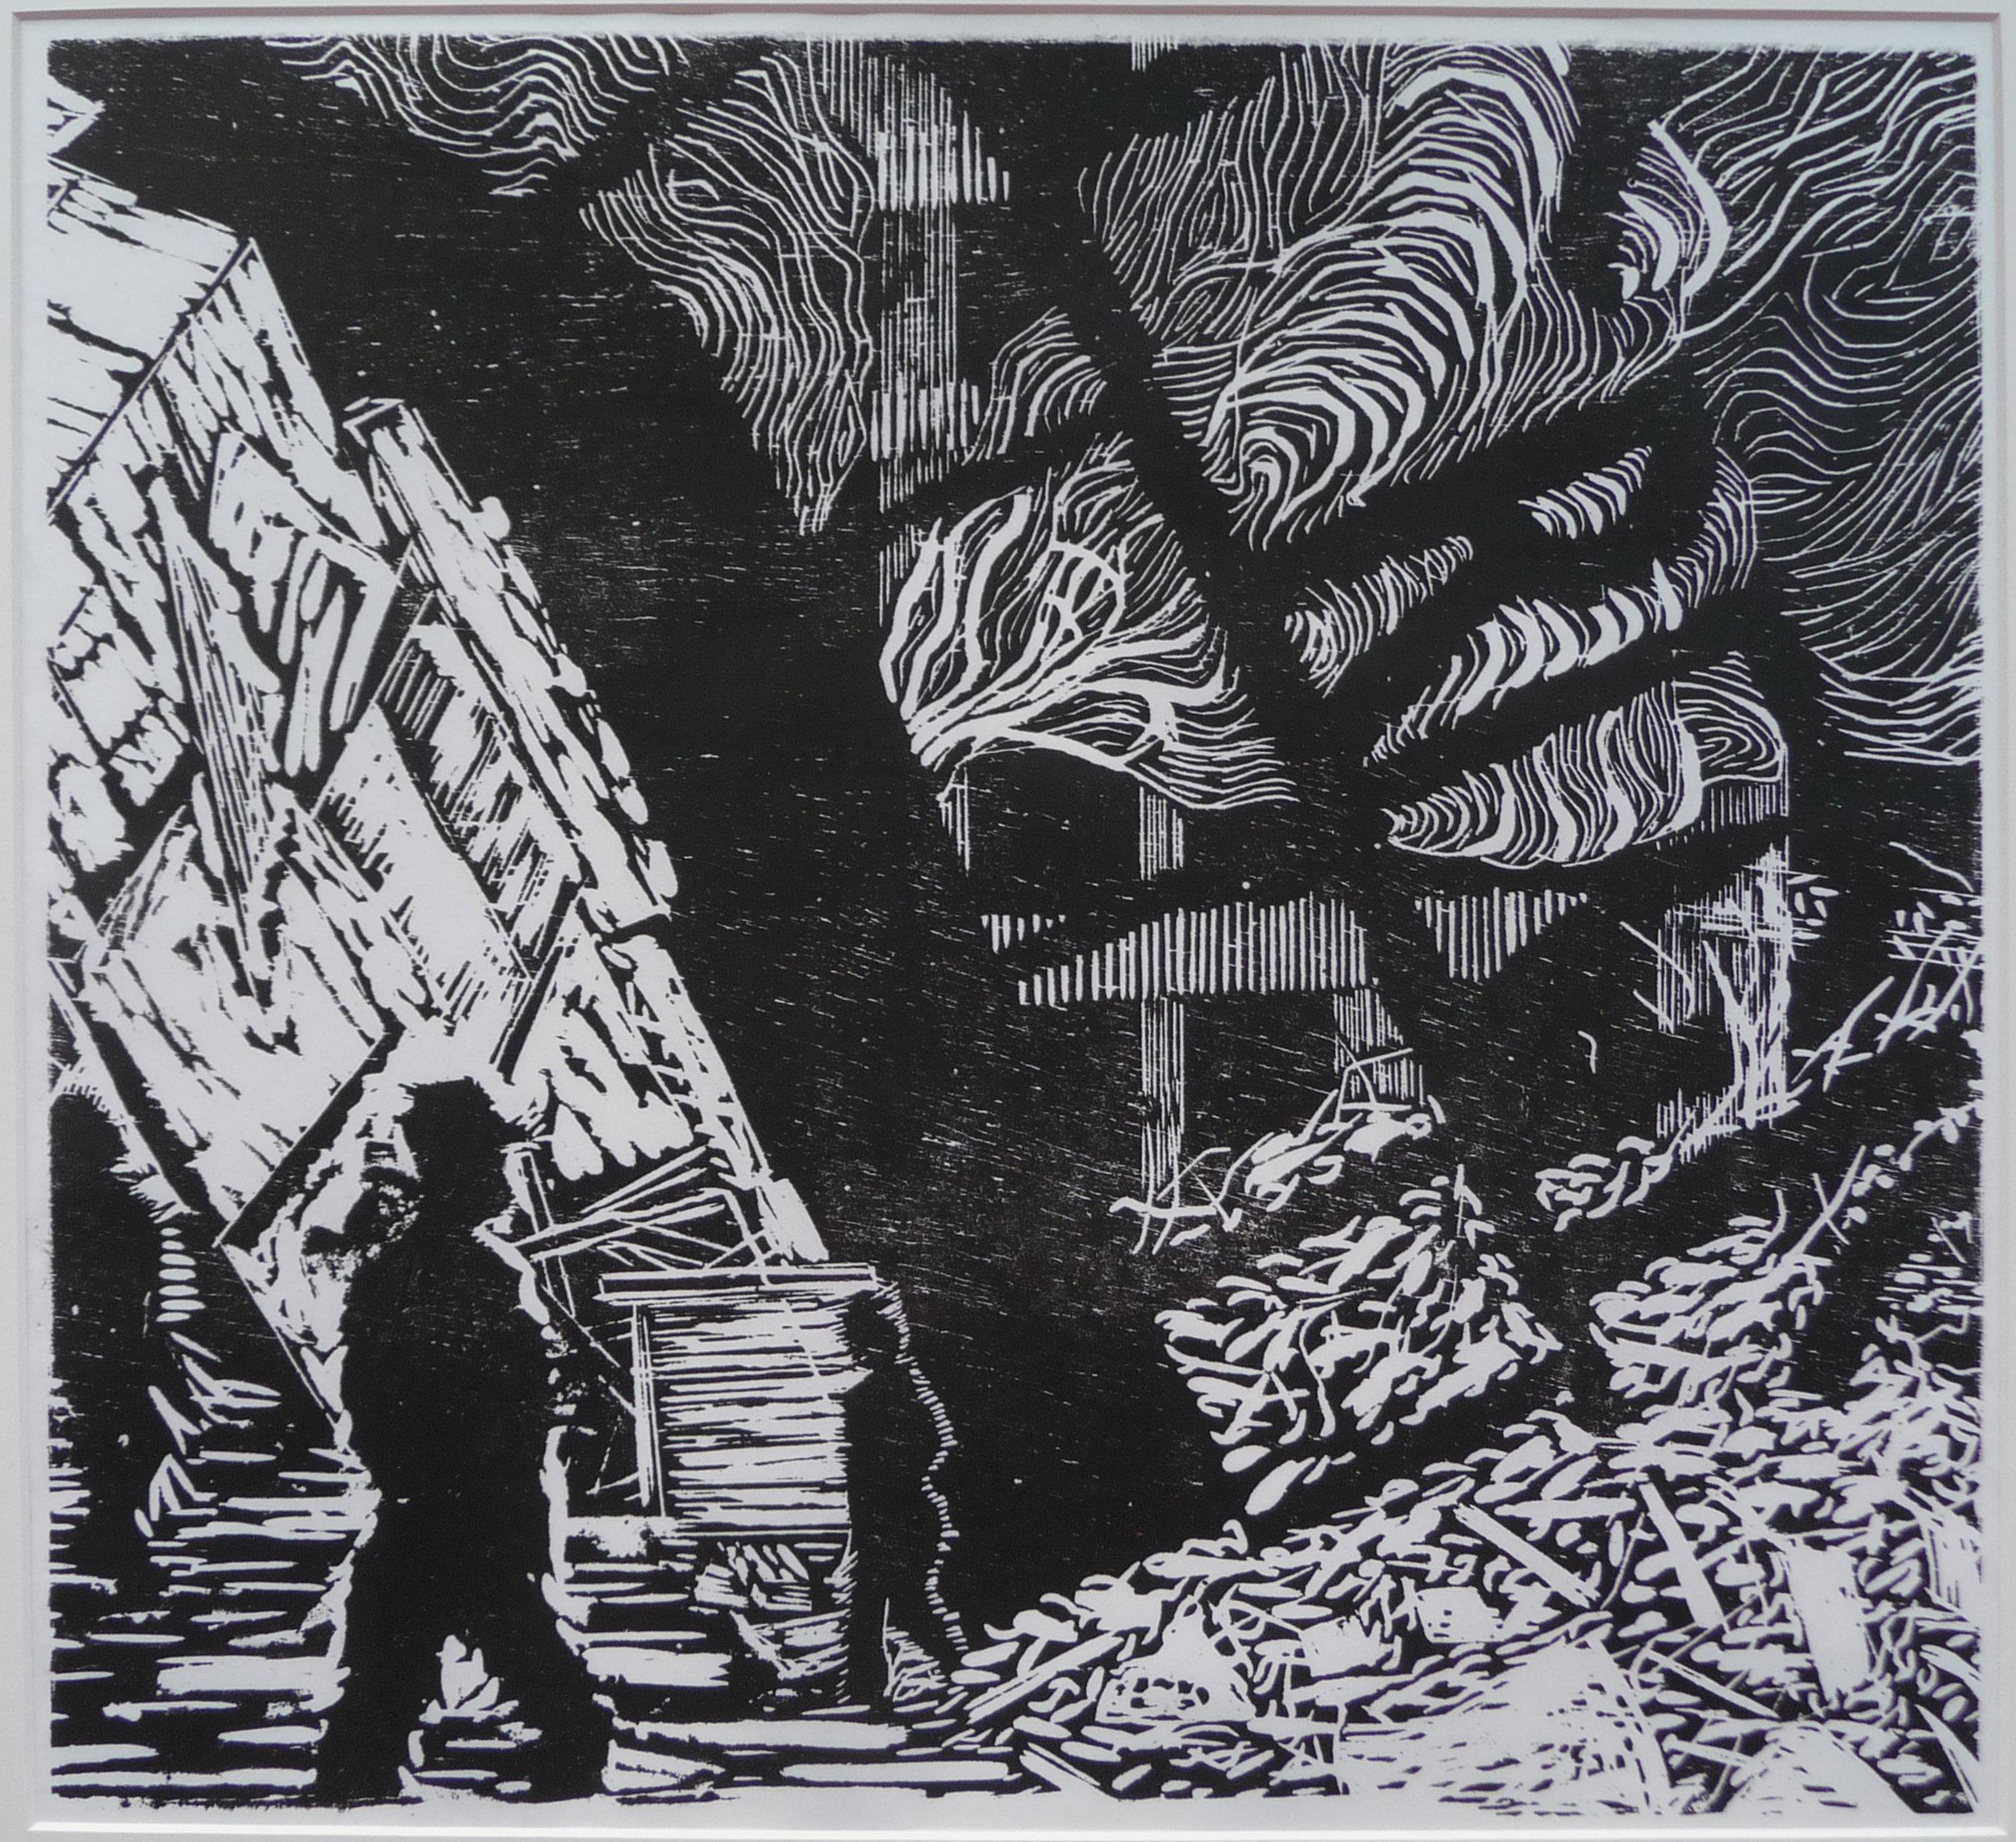 Z.t. woodcut, 48 x 52 cm, 2012